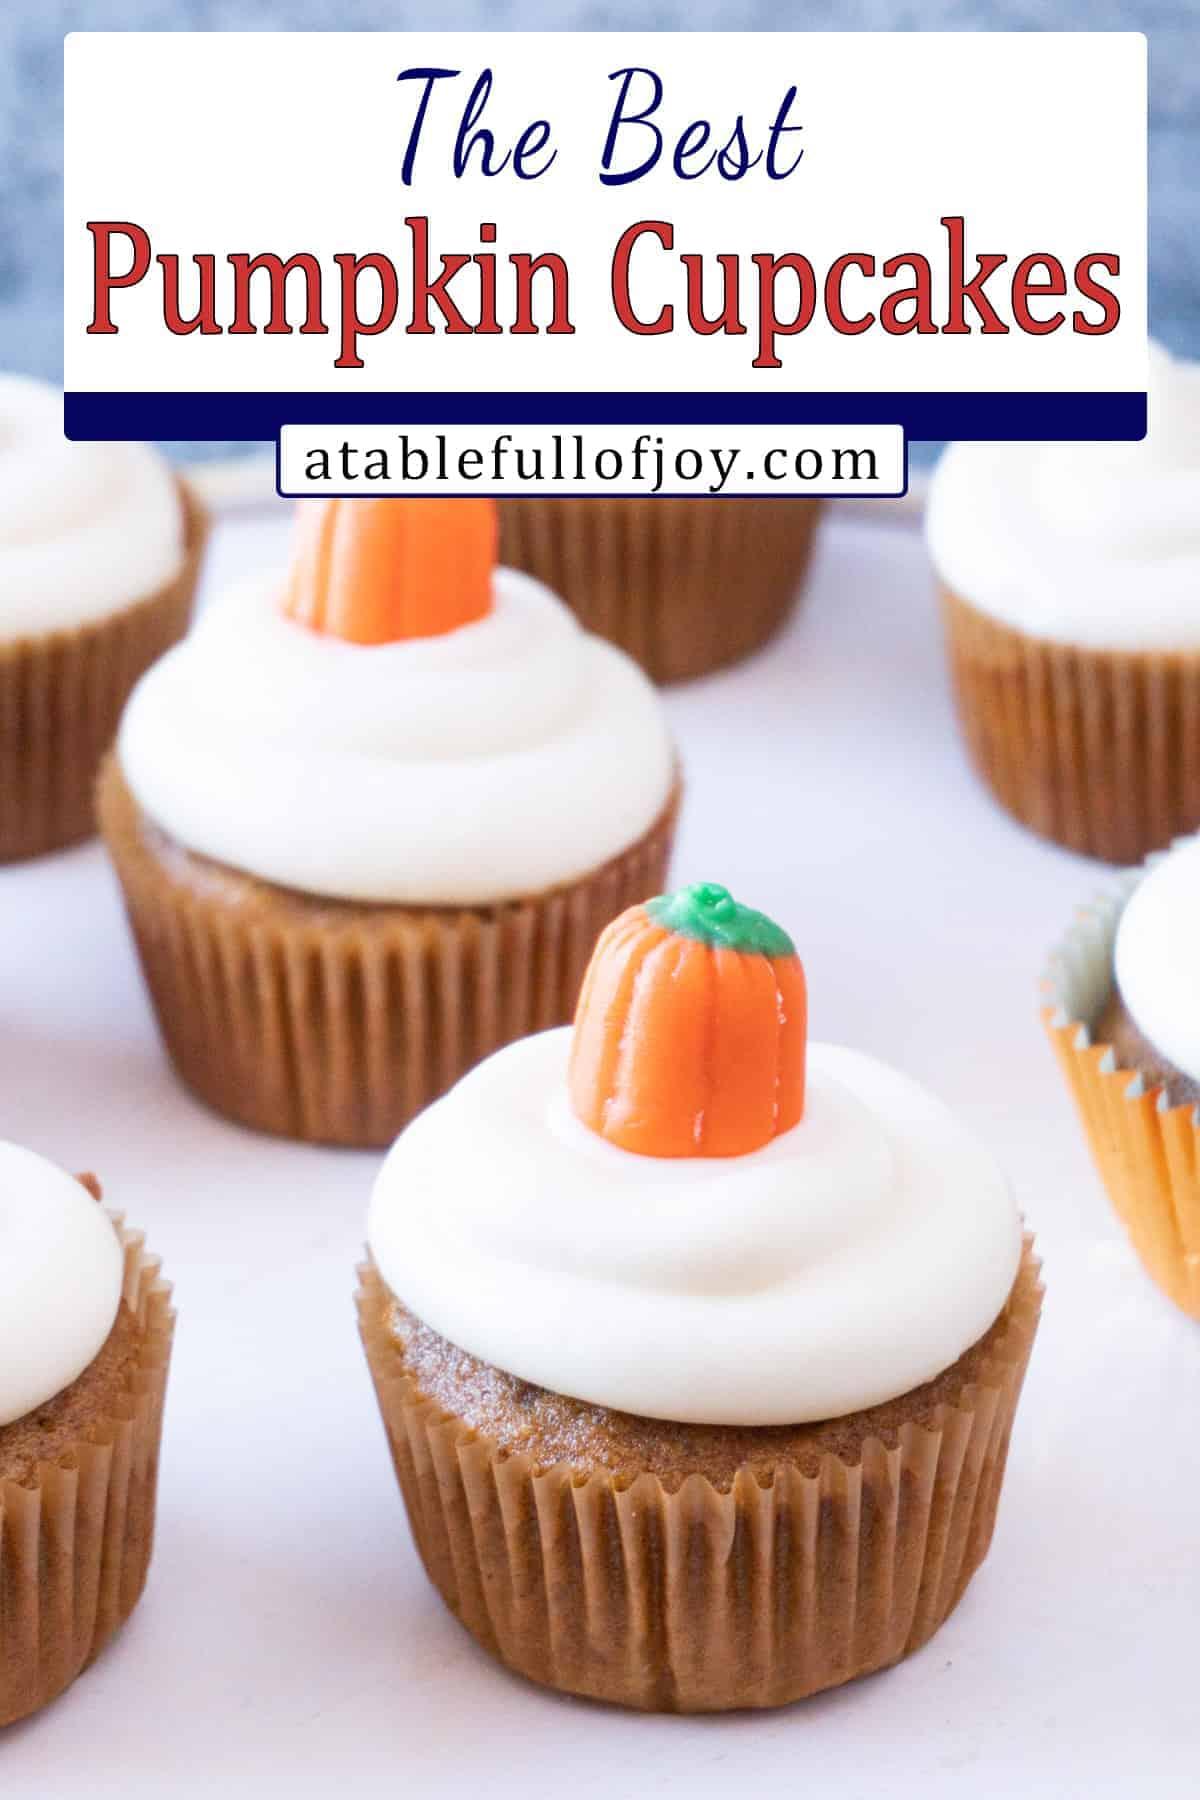 Pumpkin cupcakes pinterest pin